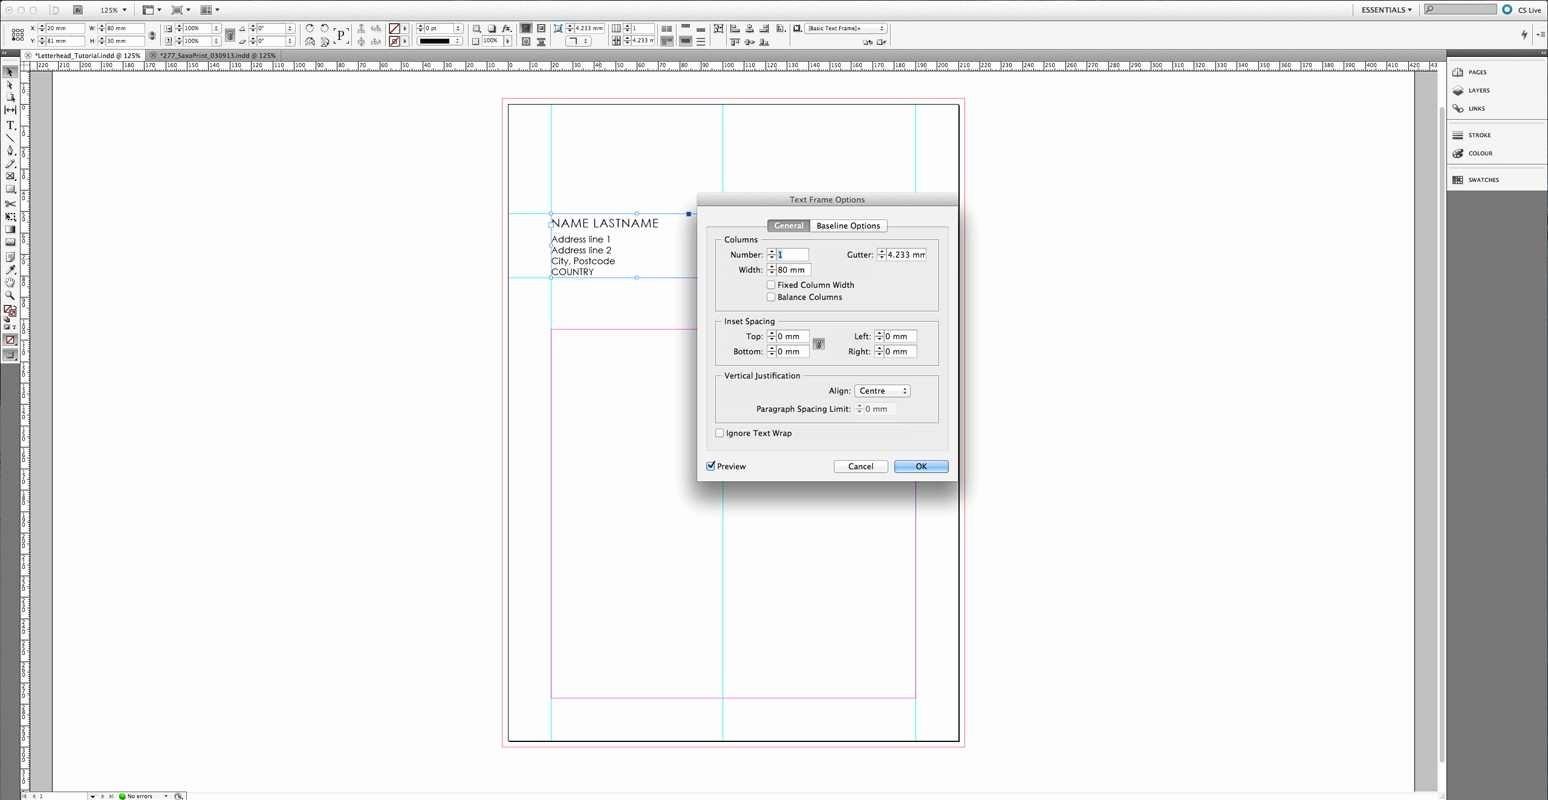 Letter Template for Window Envelopes Best Of New 9x12 Envelope Address Template